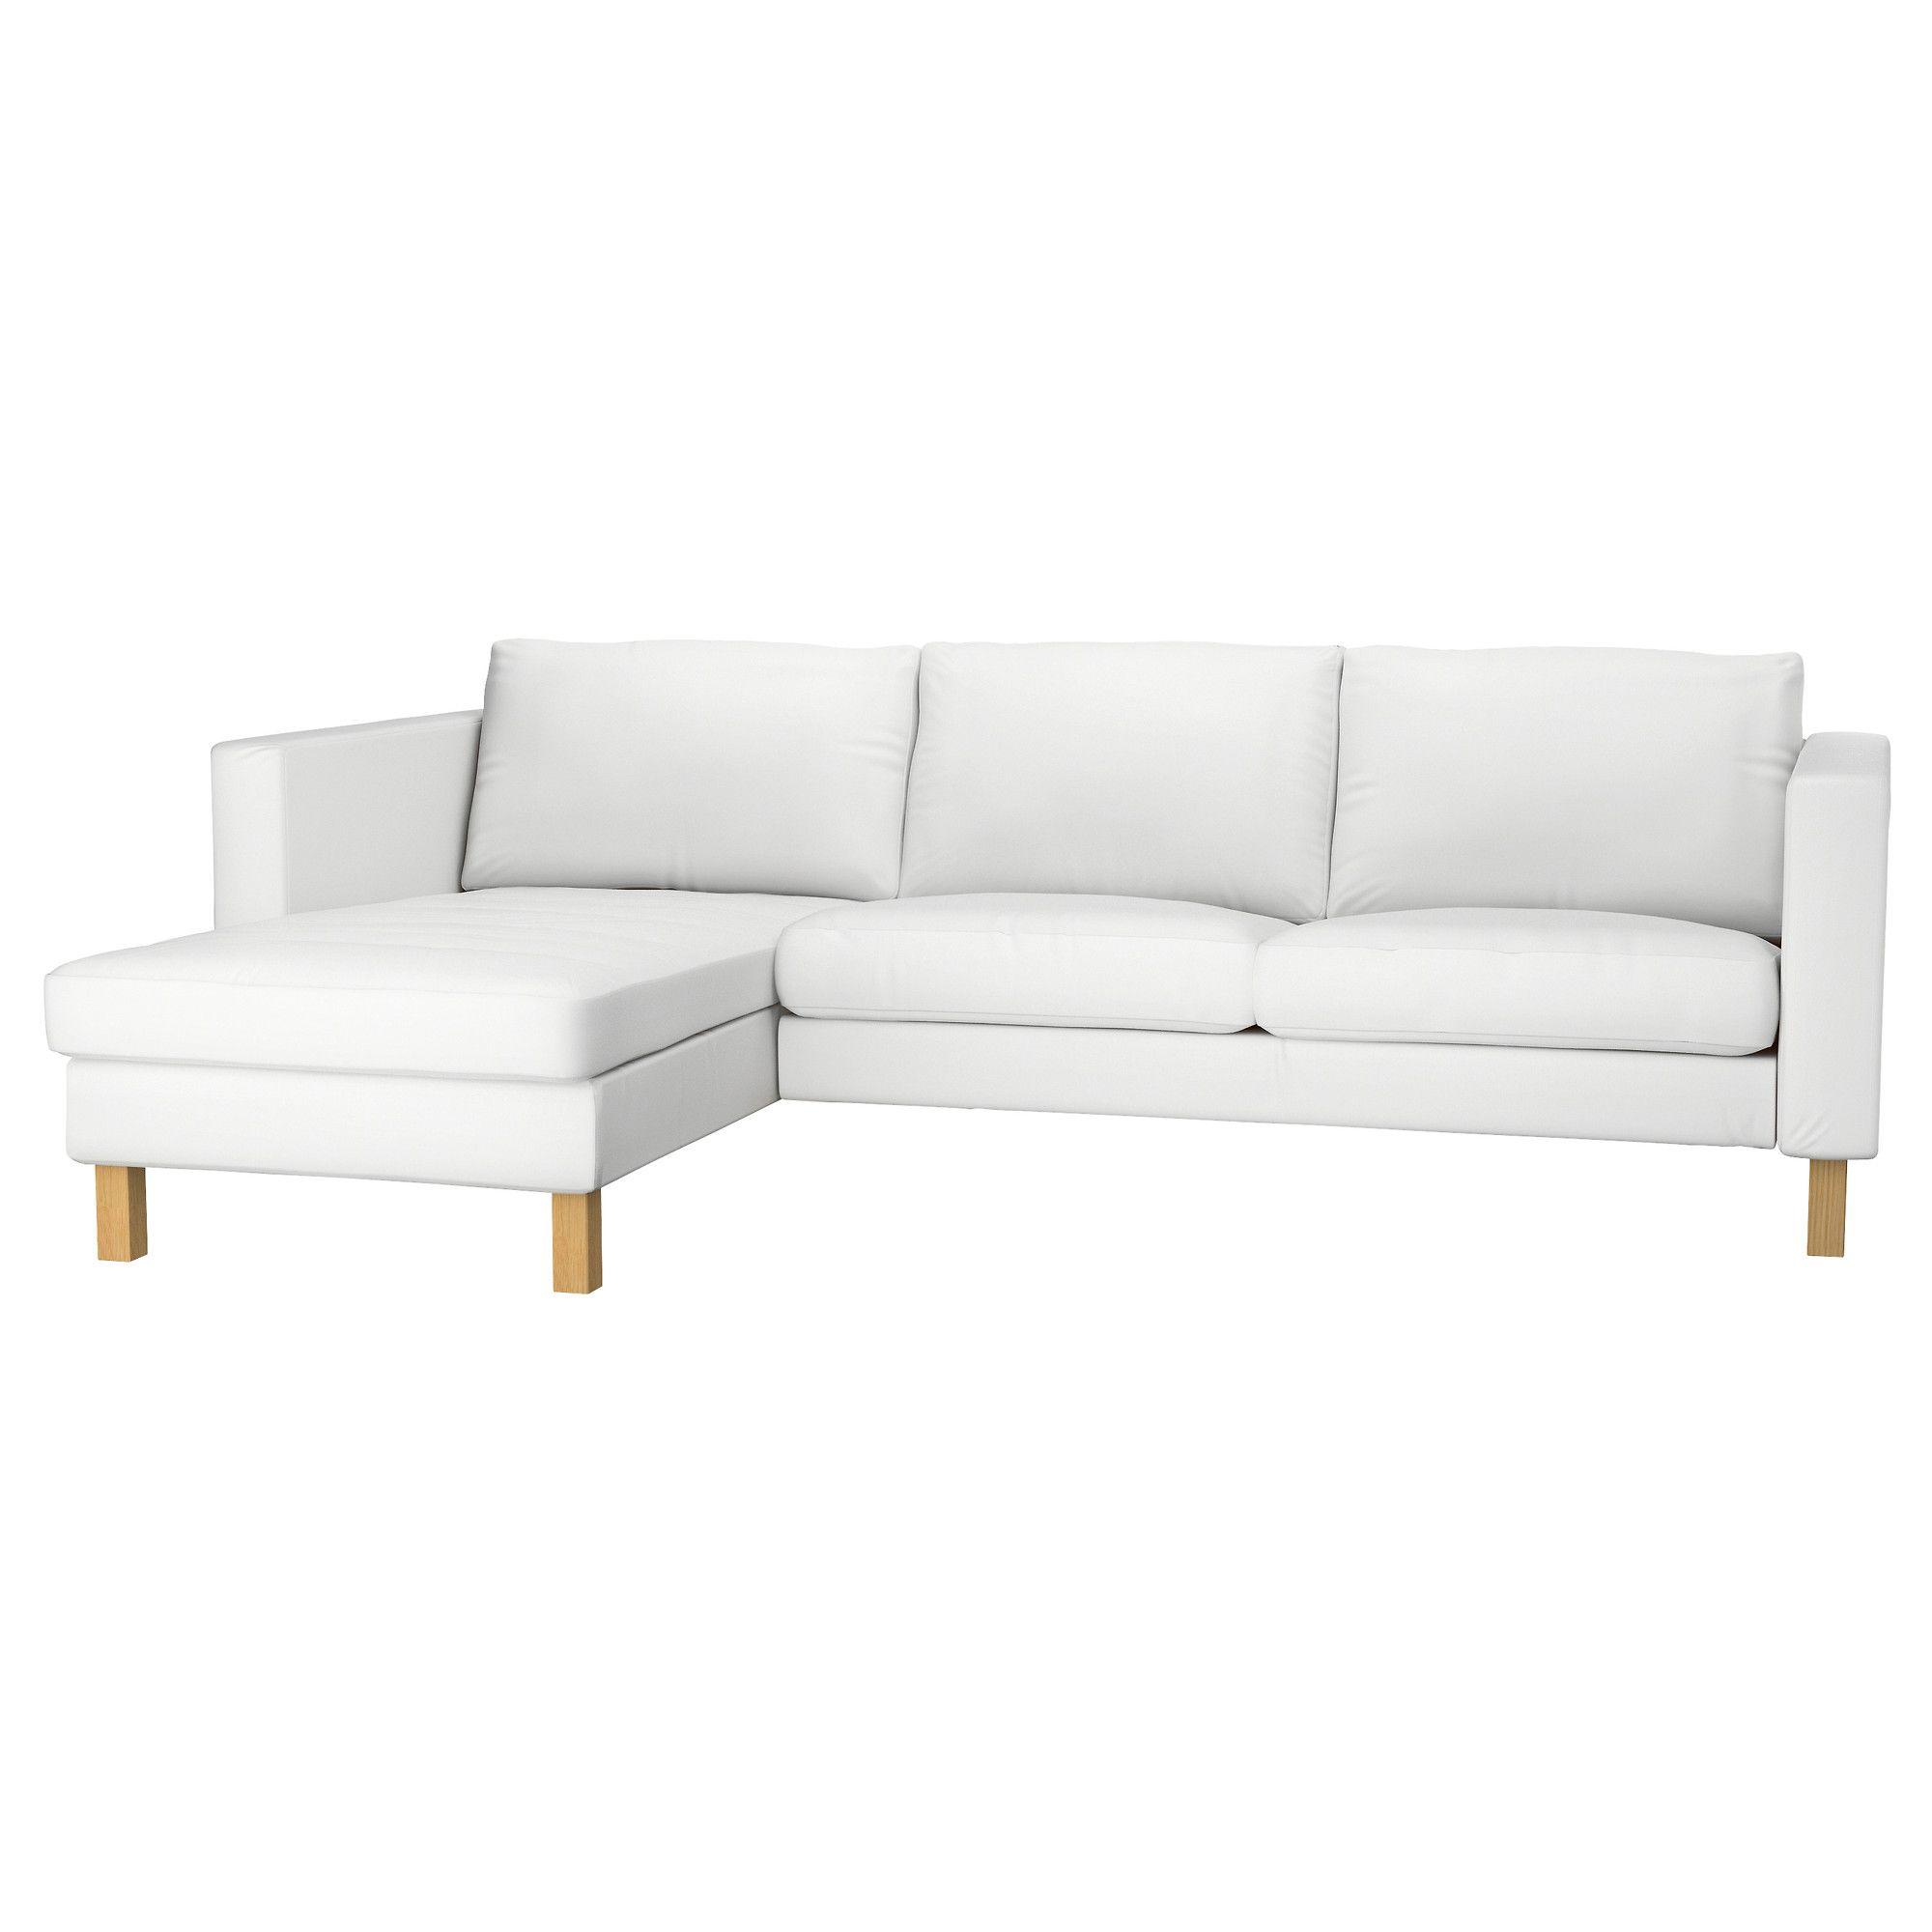 Ikea Canape Karlstad 2 Places #11: KARLSTAD Canapé 2 Places+méridienne - Blekinge Blanc - IKEA